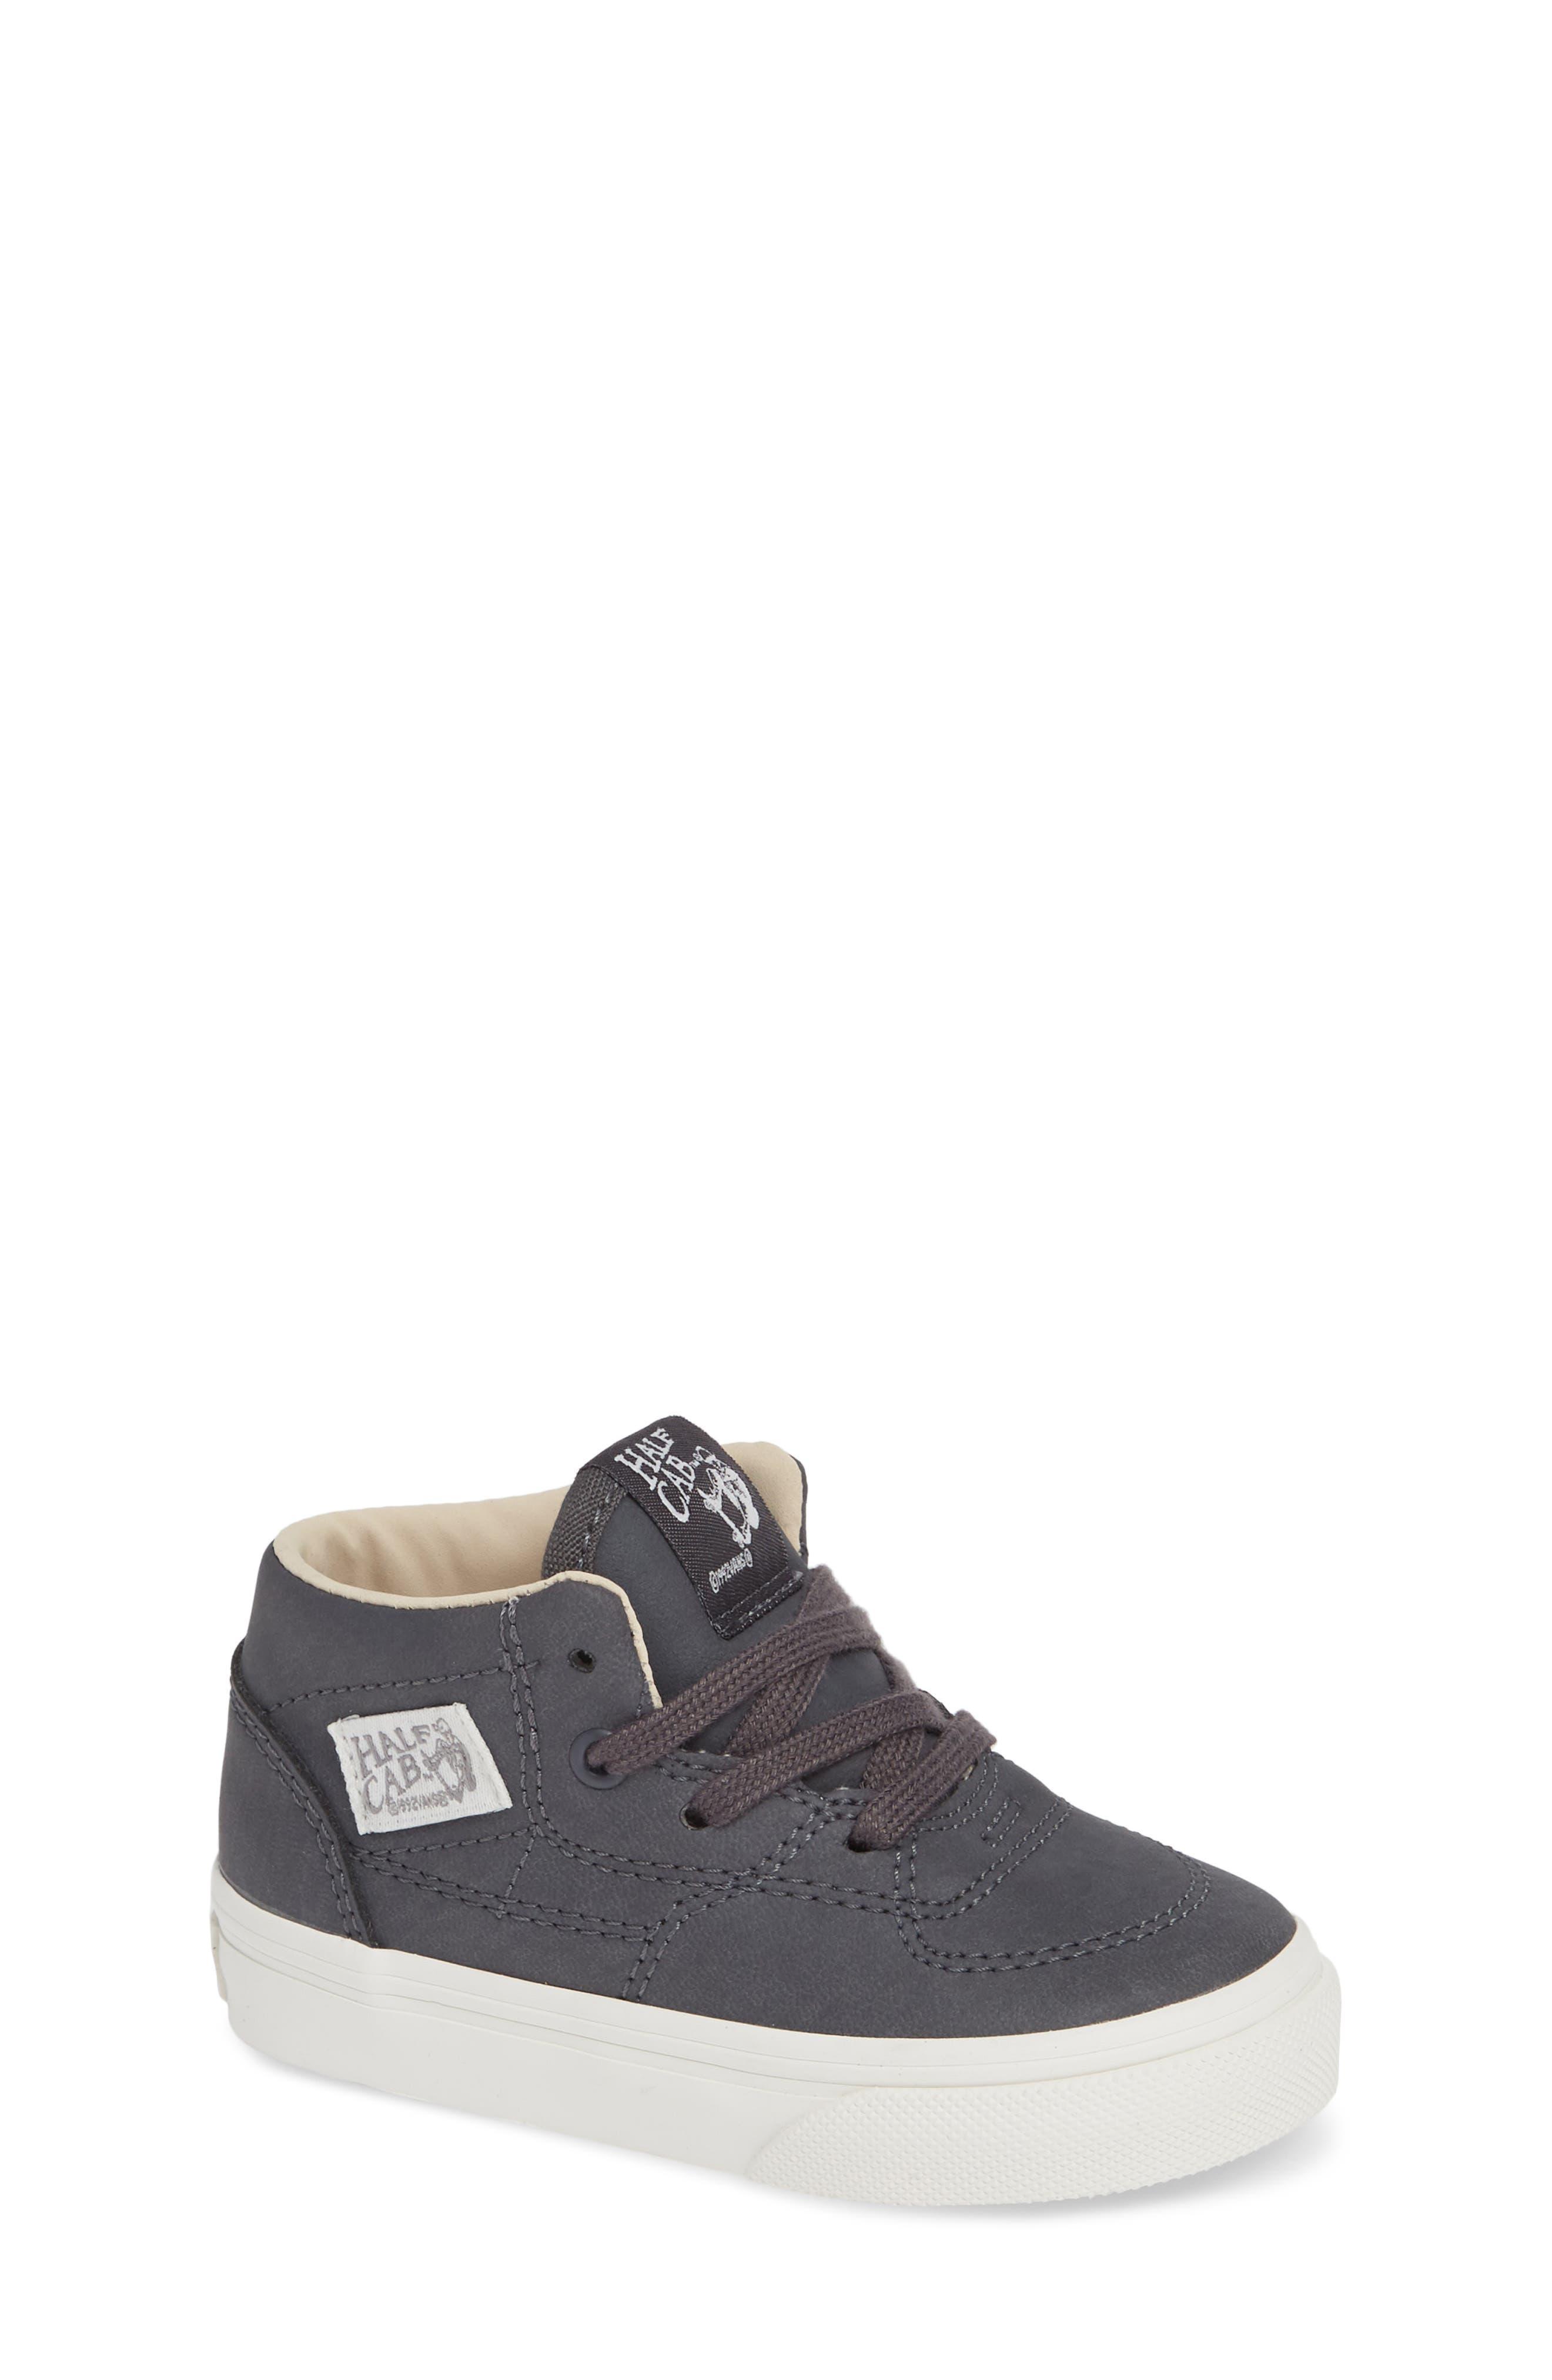 Half Cab Sneaker,                         Main,                         color, VANSBUCK ASPHALT/ BLANC